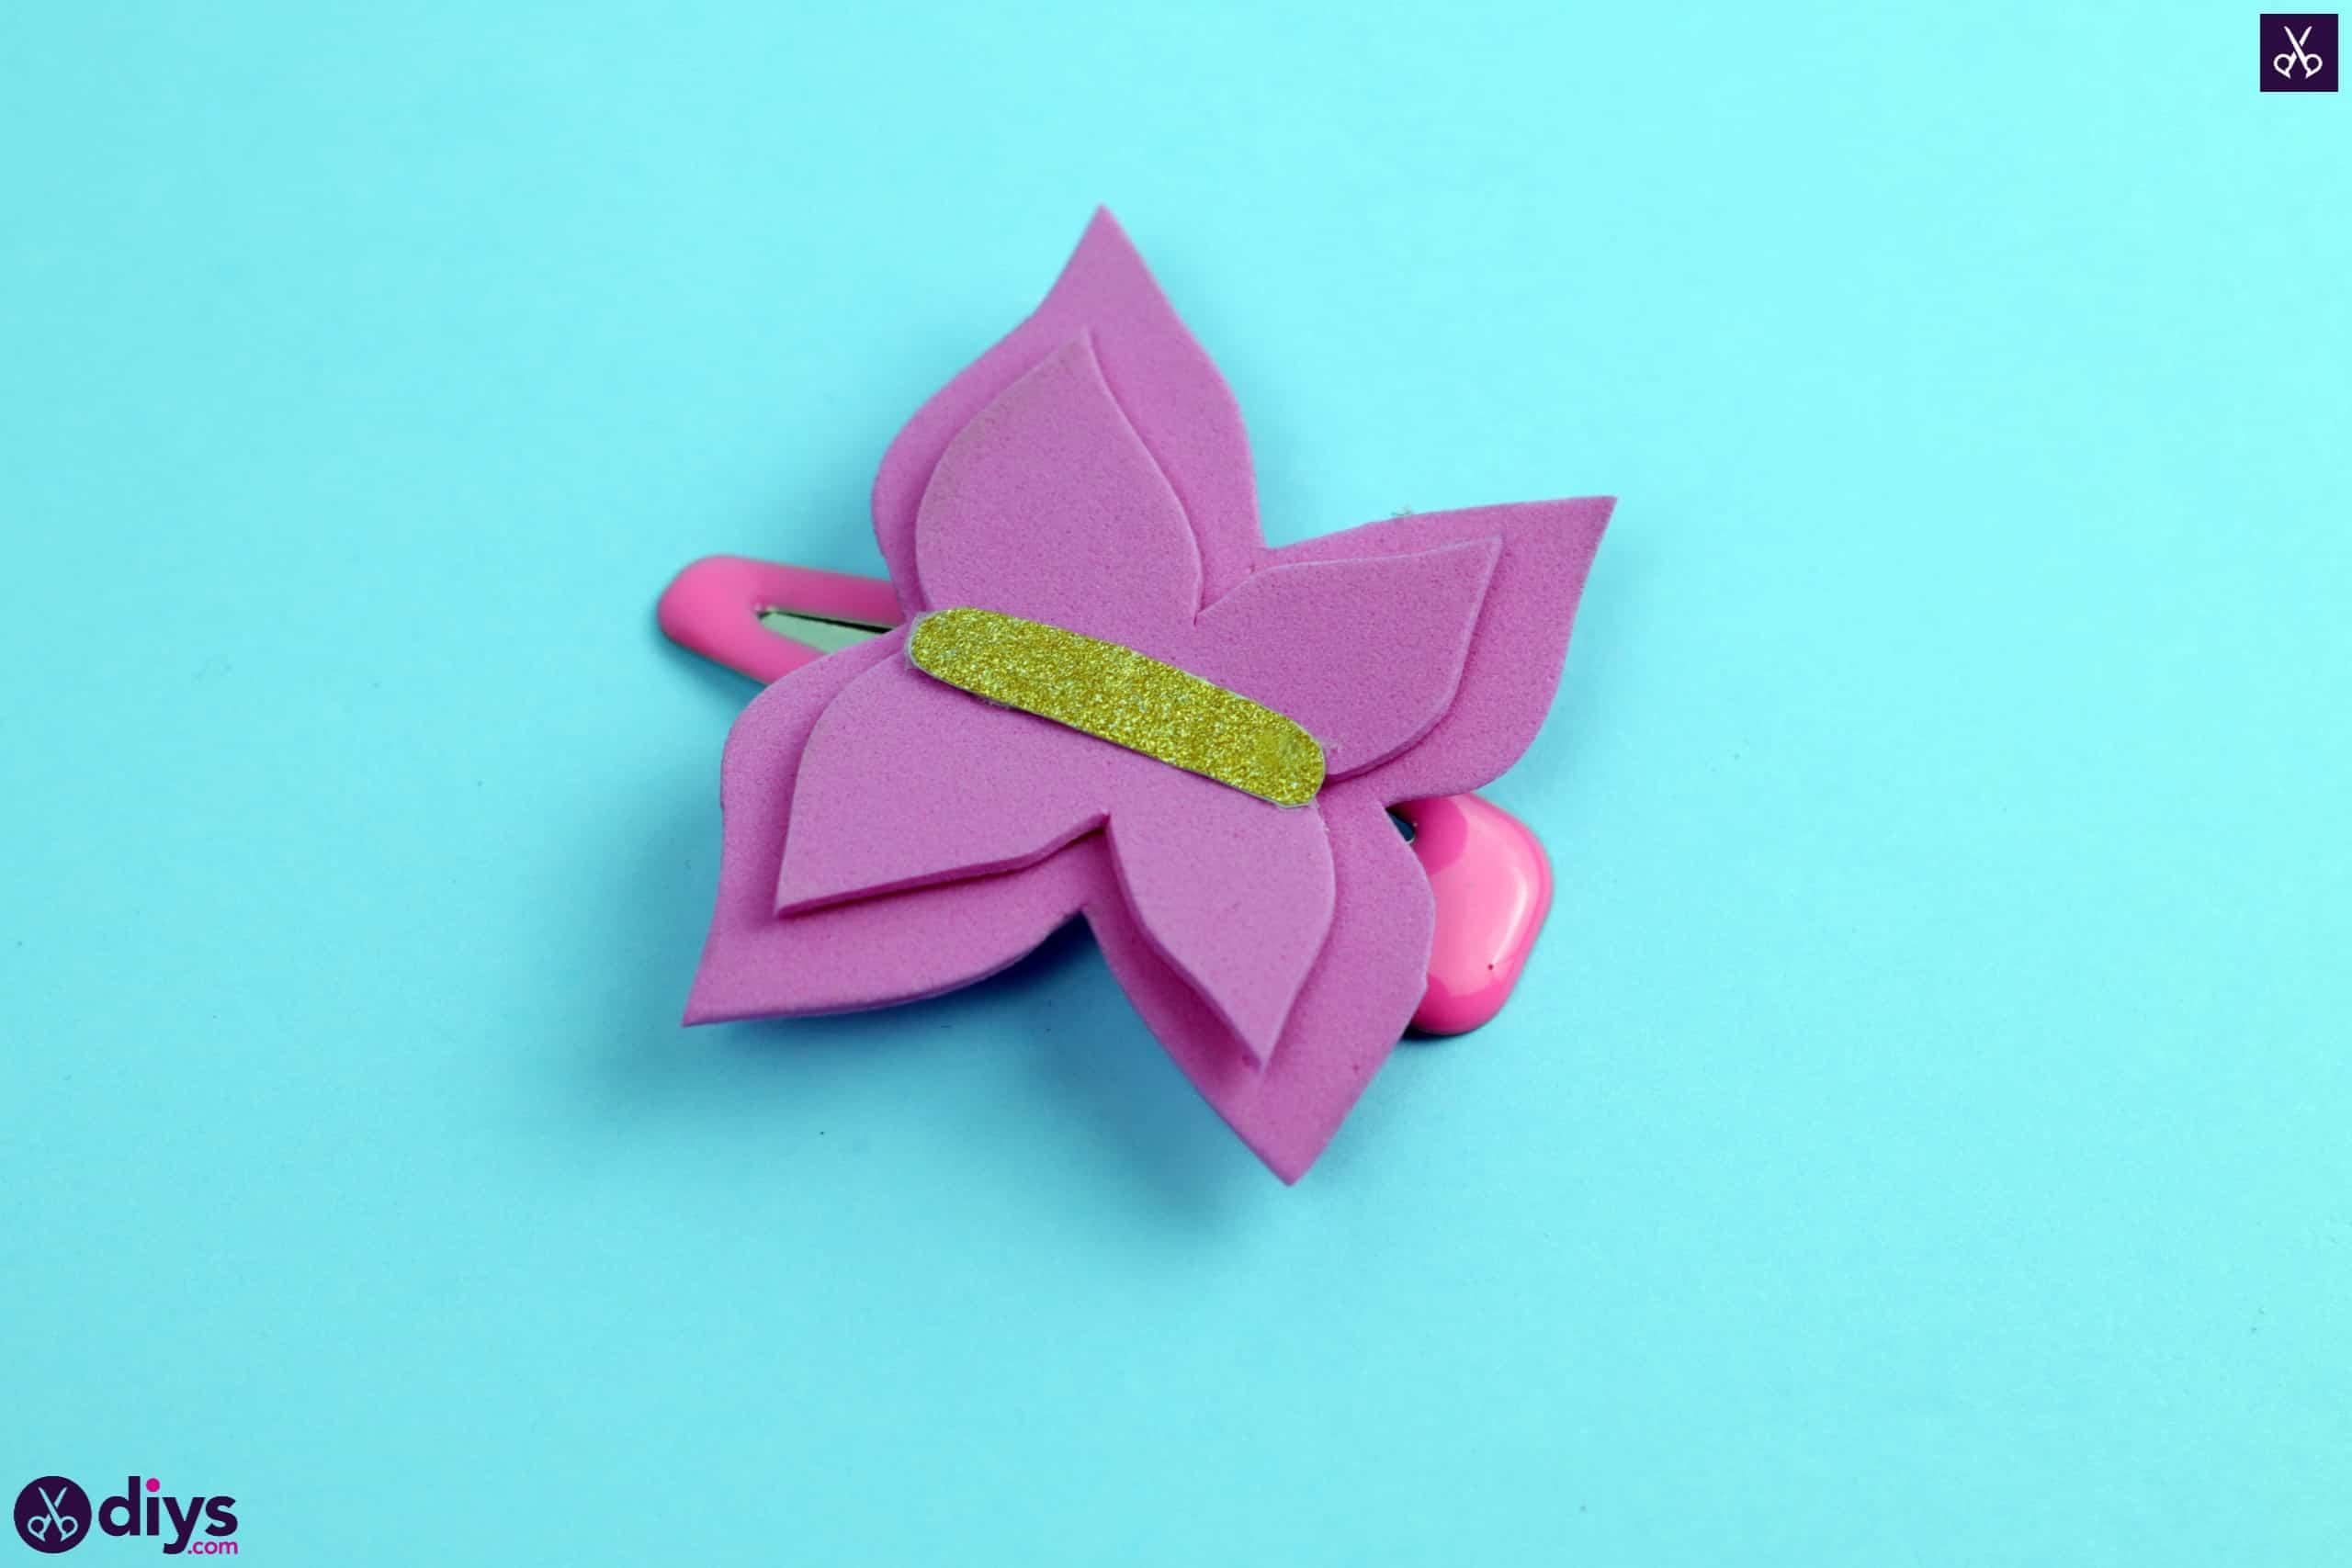 Diy butterfly barrette simple project